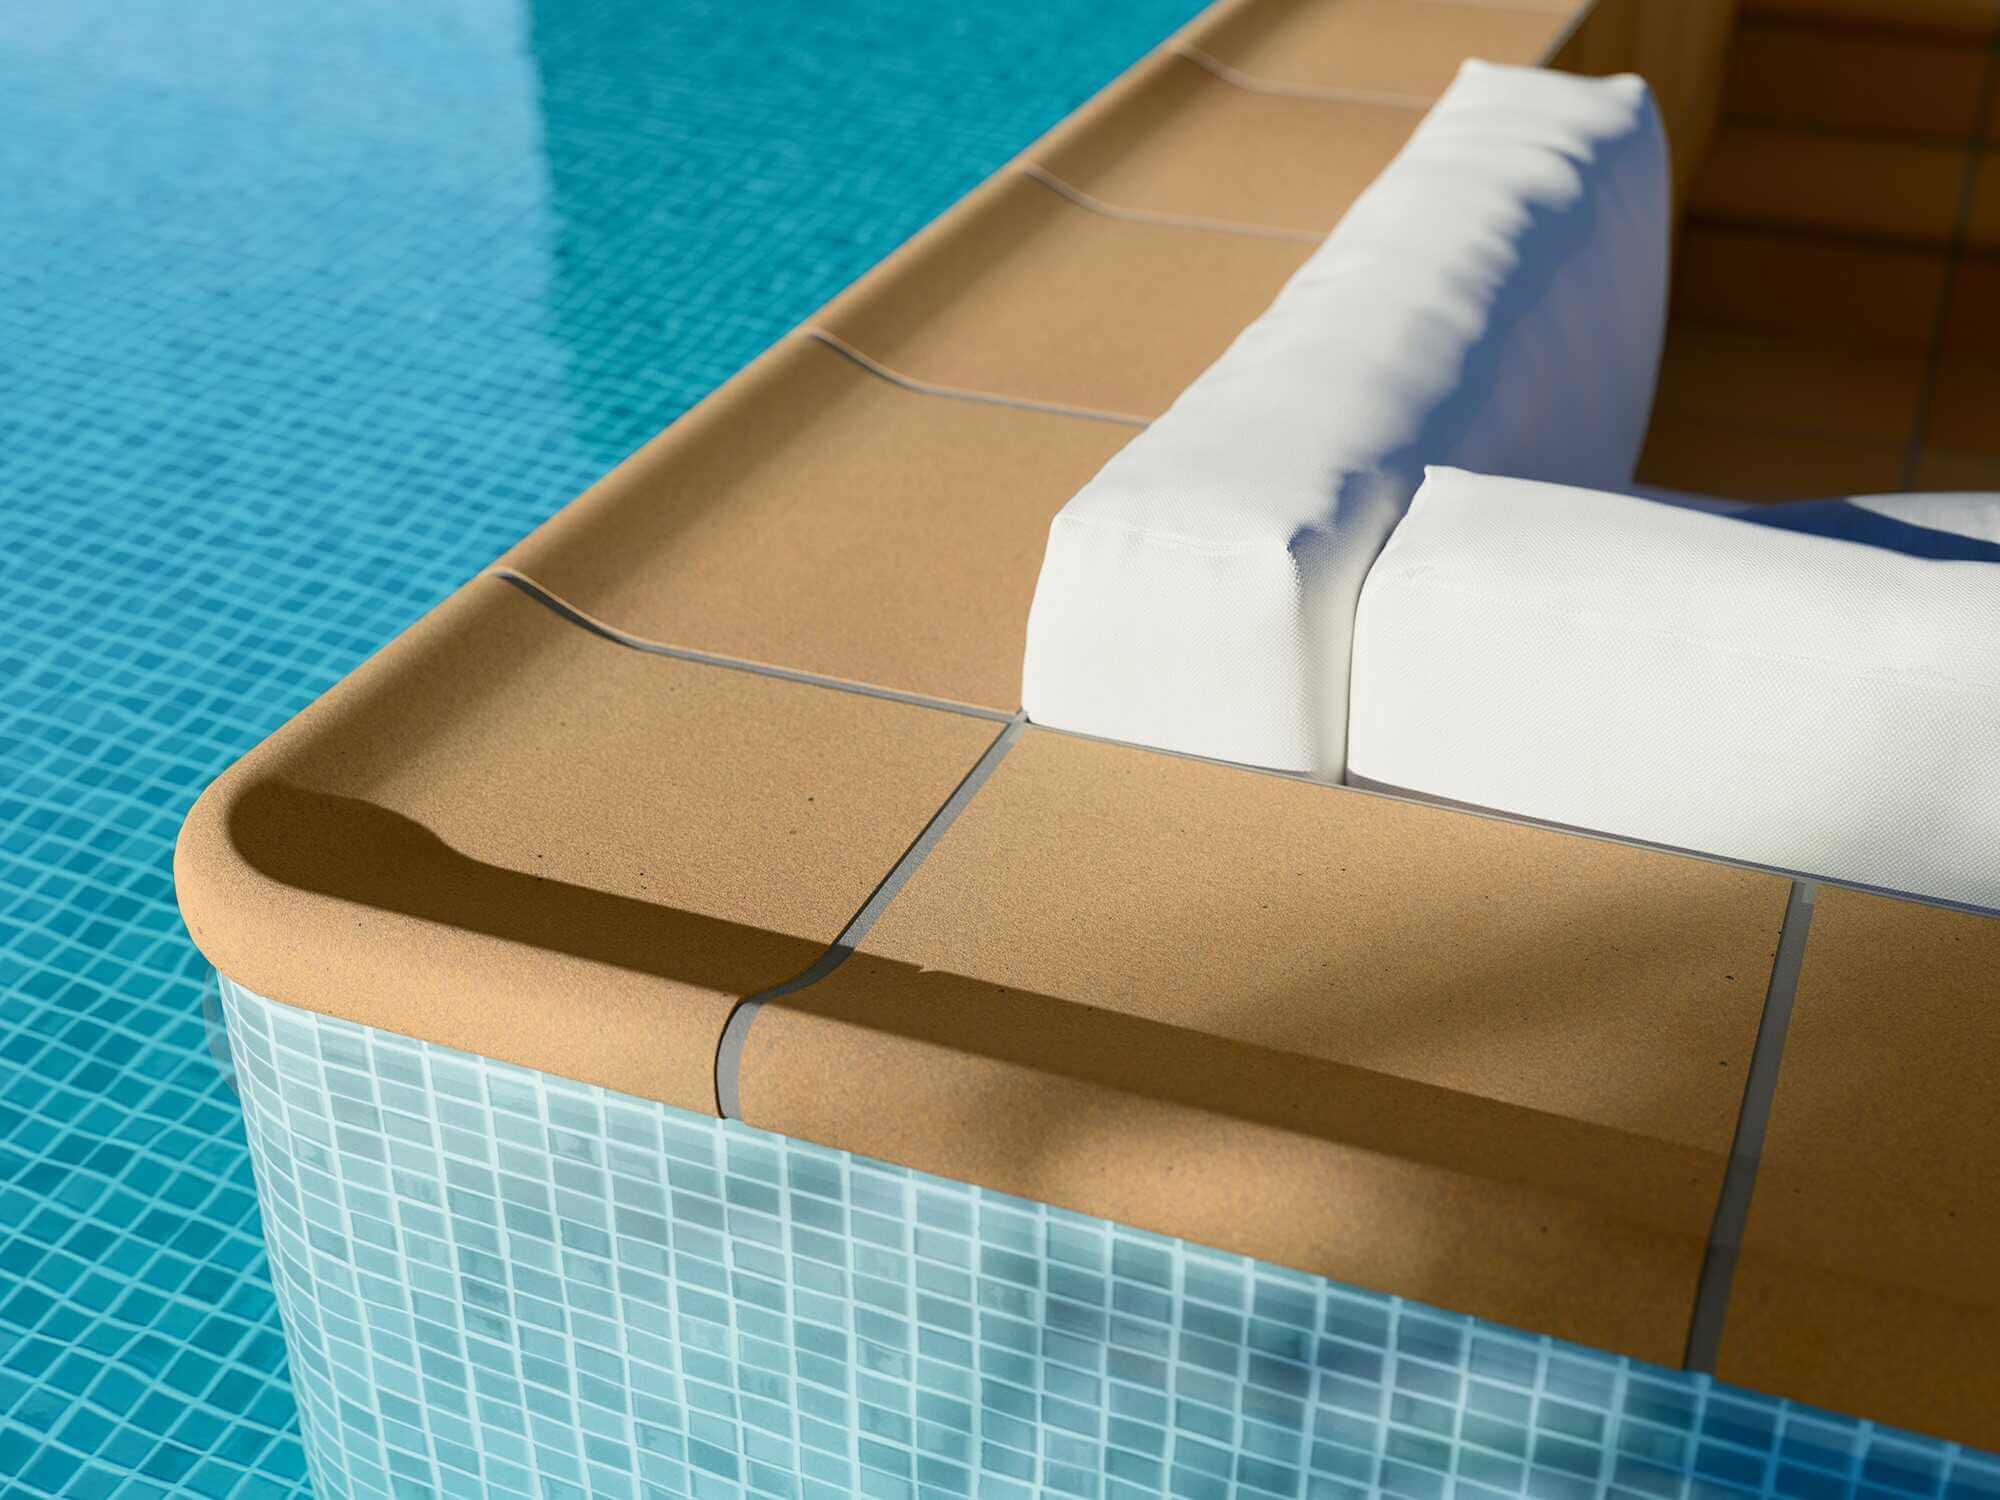 EXT DENIA Terraza piscina detalle - Baldosas para Piscinas: cómo Elegir las más Adecuadas